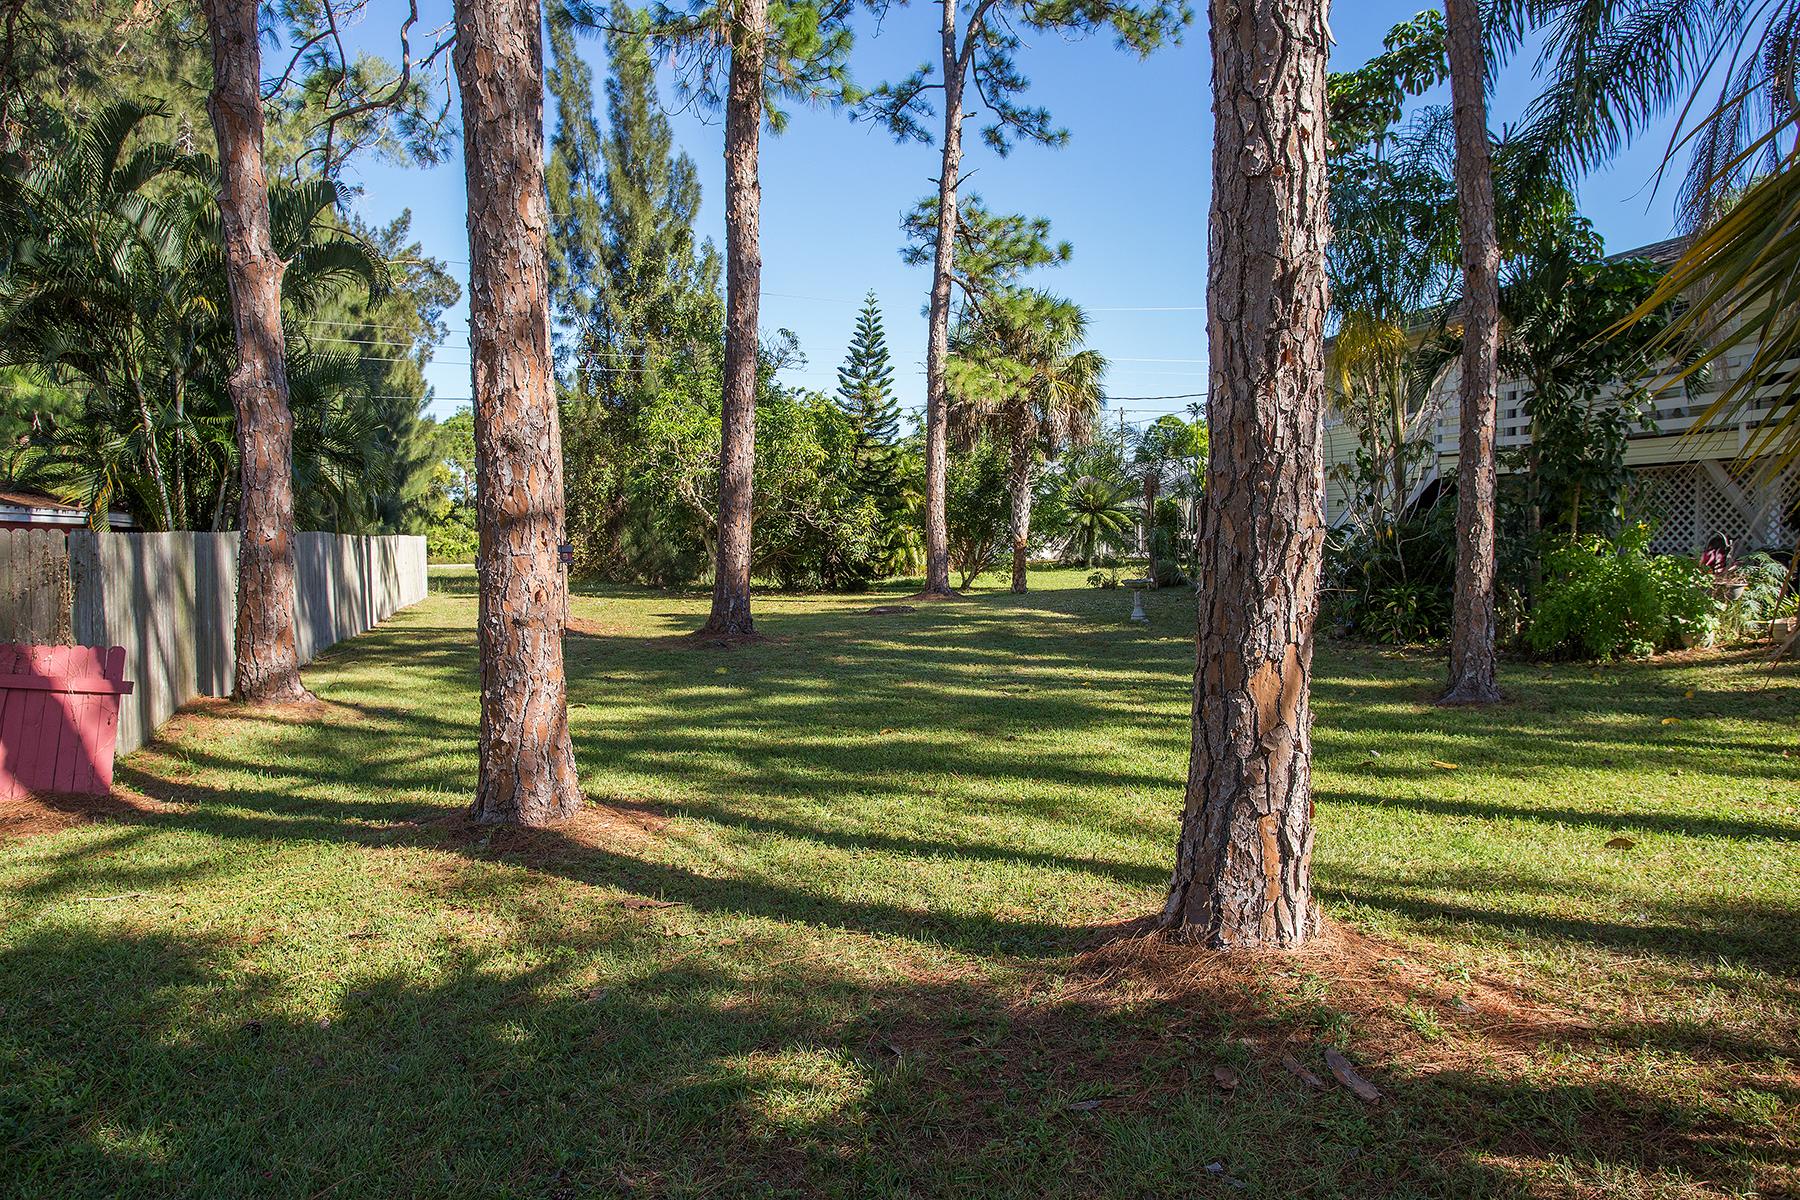 Terreno per Vendita alle ore NAPLES PARK 767 110th Ave N Naples, Florida, 34108 Stati Uniti